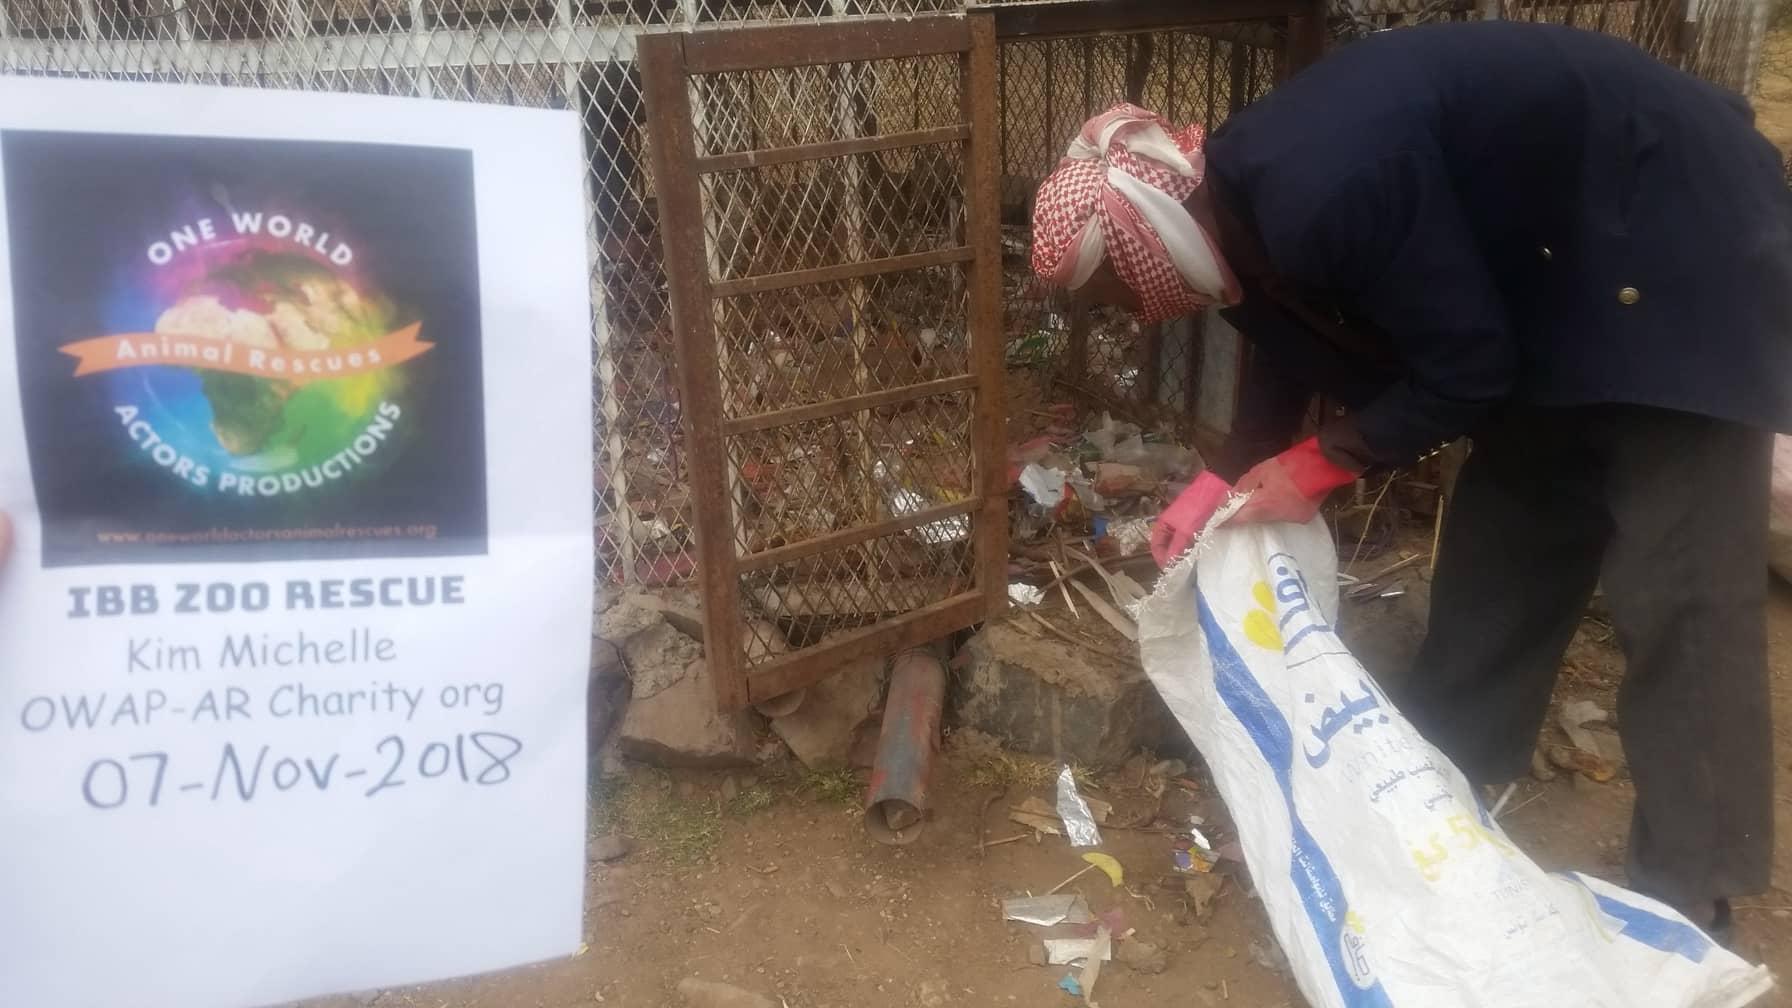 ibb zoo cage cleaning abdulrazak NOV 7th 2018 by OWAP AR.jpg